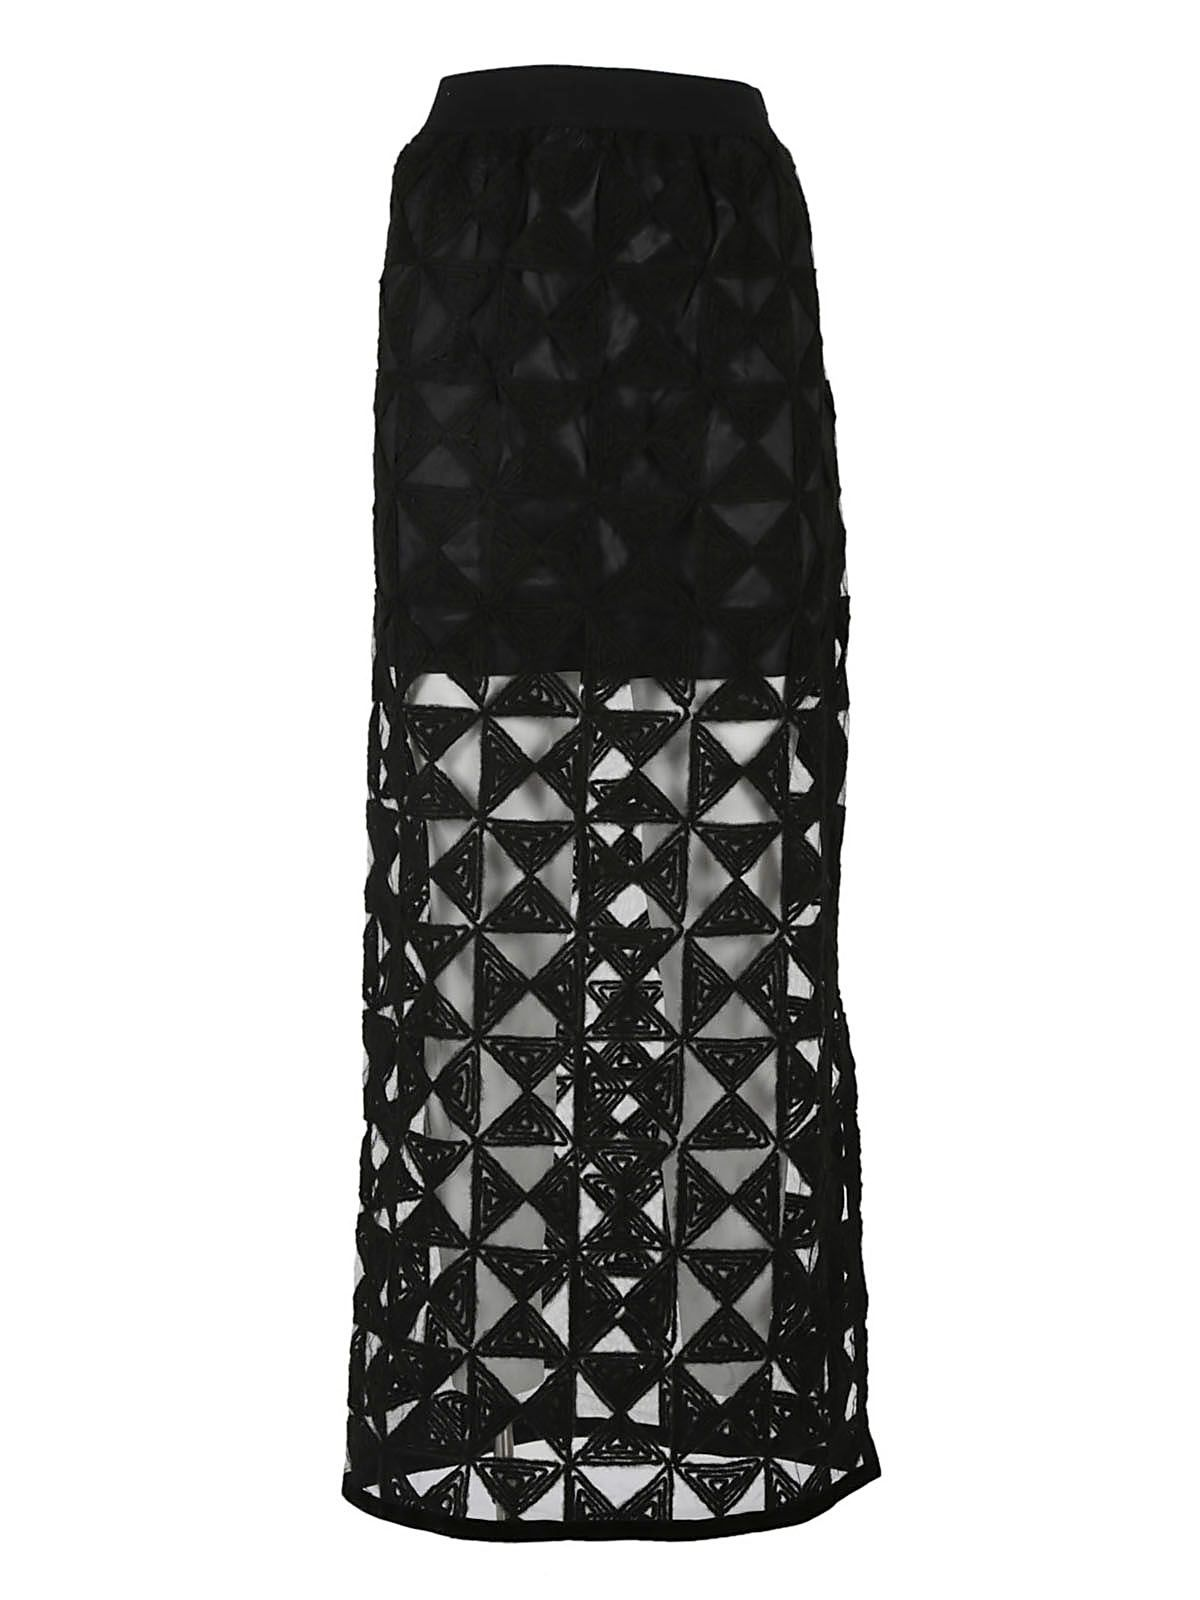 Federica Tosi Embroidered Long Skirt